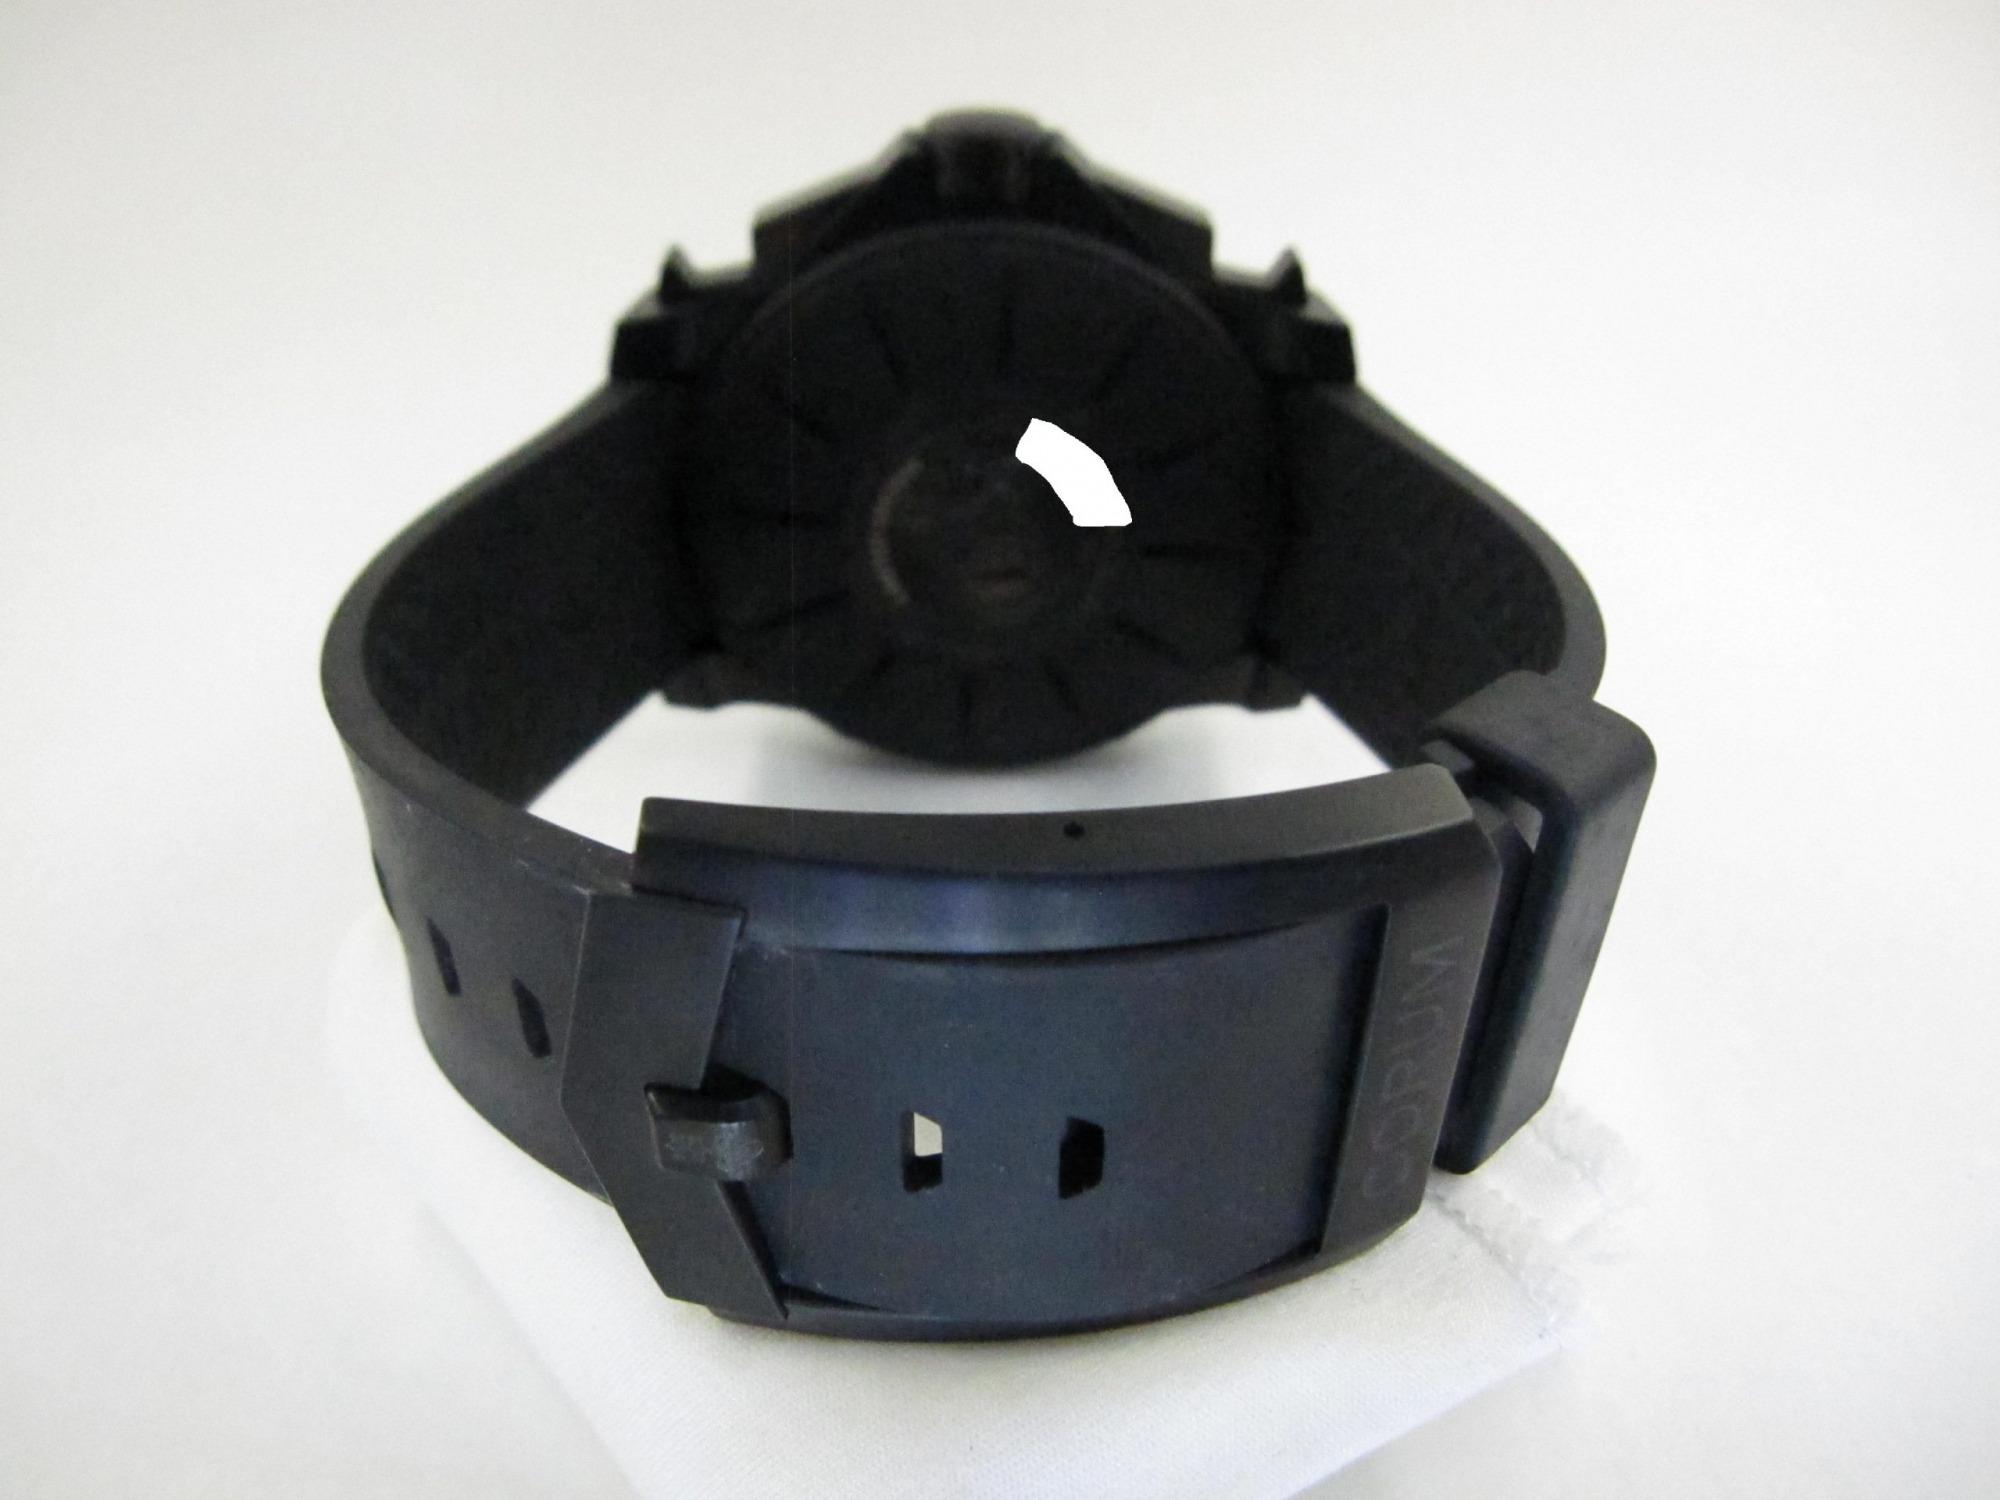 Corum Admirals Cup Black Hull 753.934.95-0371-AN92(Unworn)CR-019